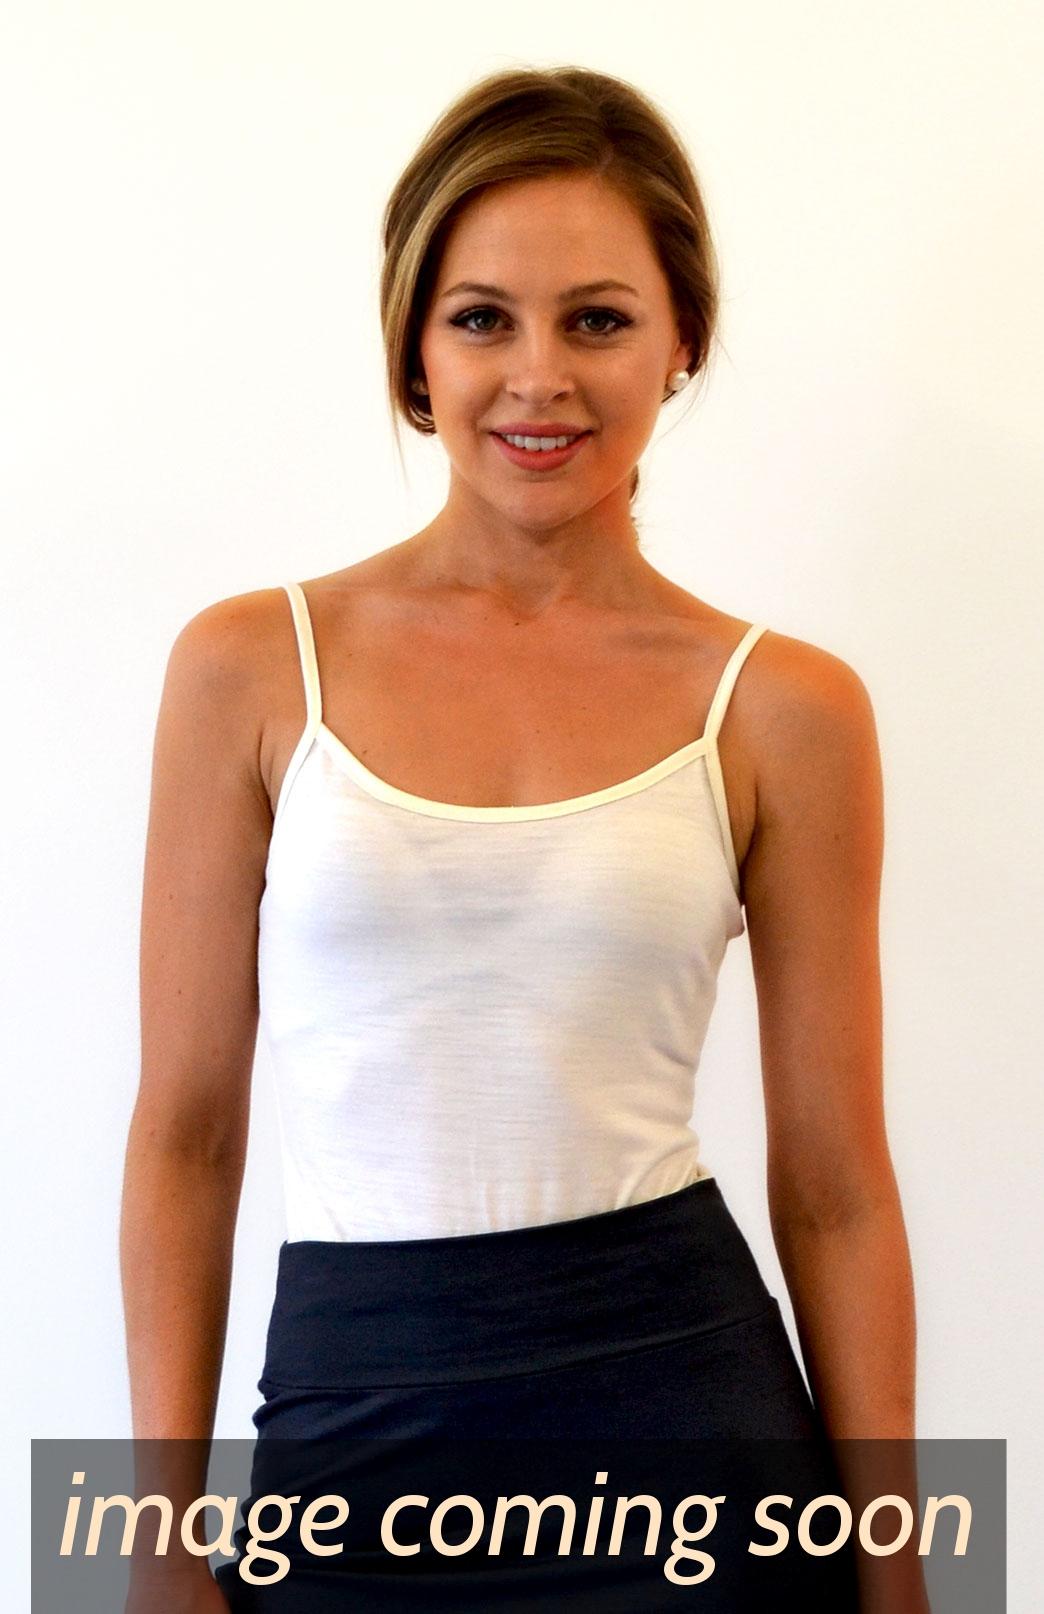 Camisole Top - Women's Wool Cream Camisole Layering Thermal Tank Top - Smitten Merino Tasmania Australia